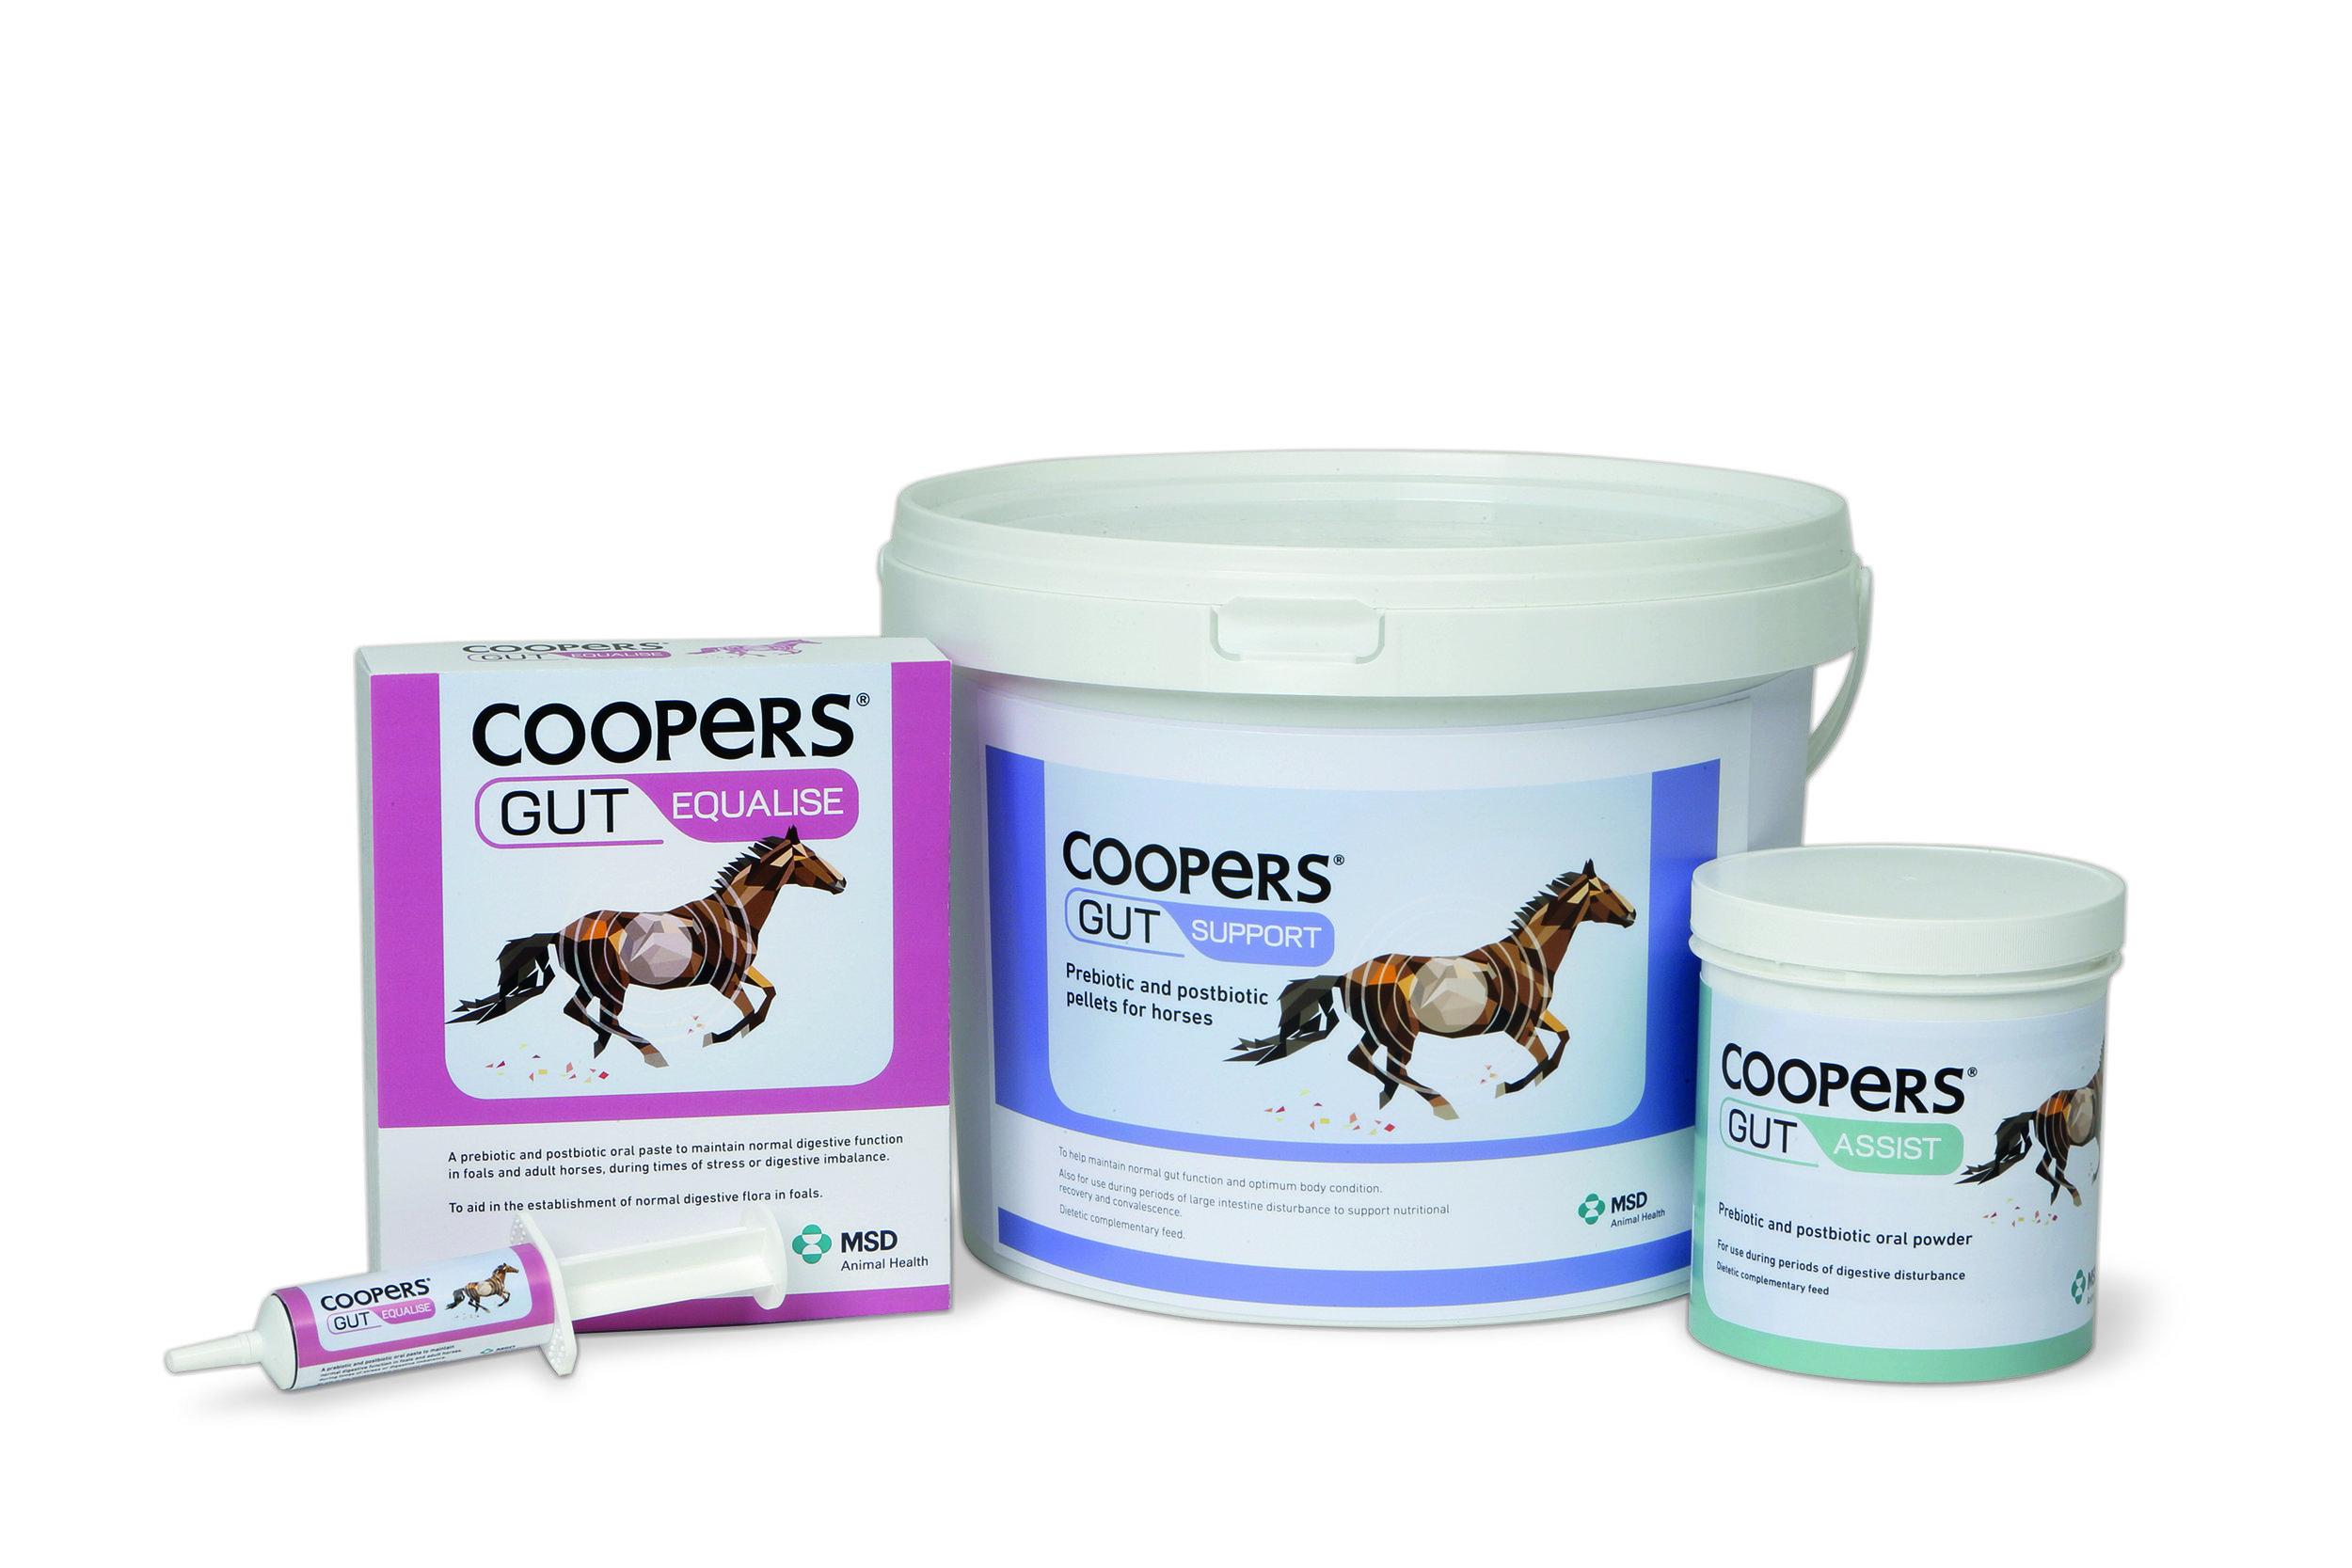 The Coopers Gut range